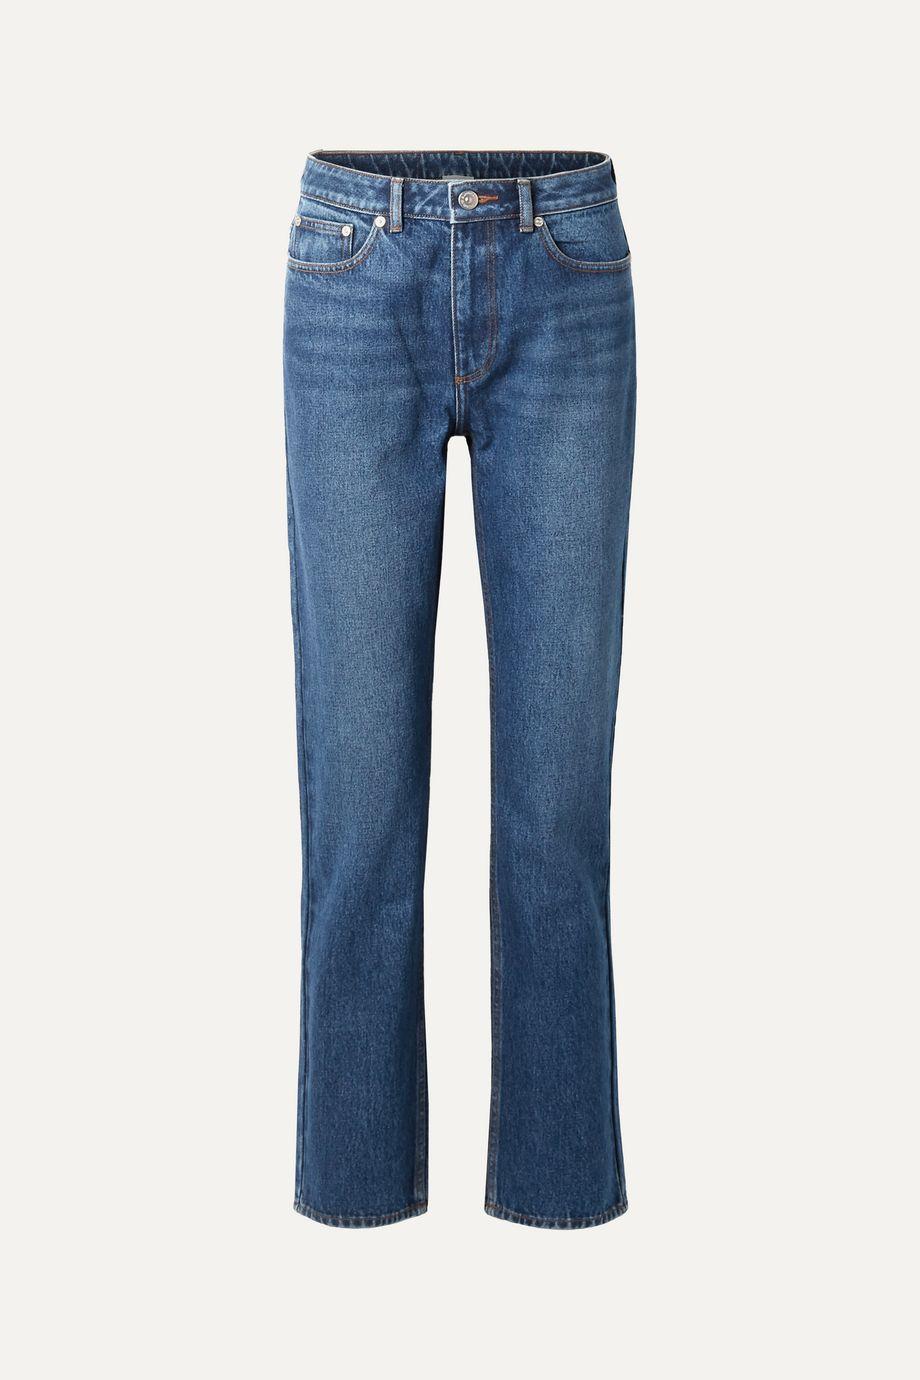 Burberry High-rise straight-leg jeans